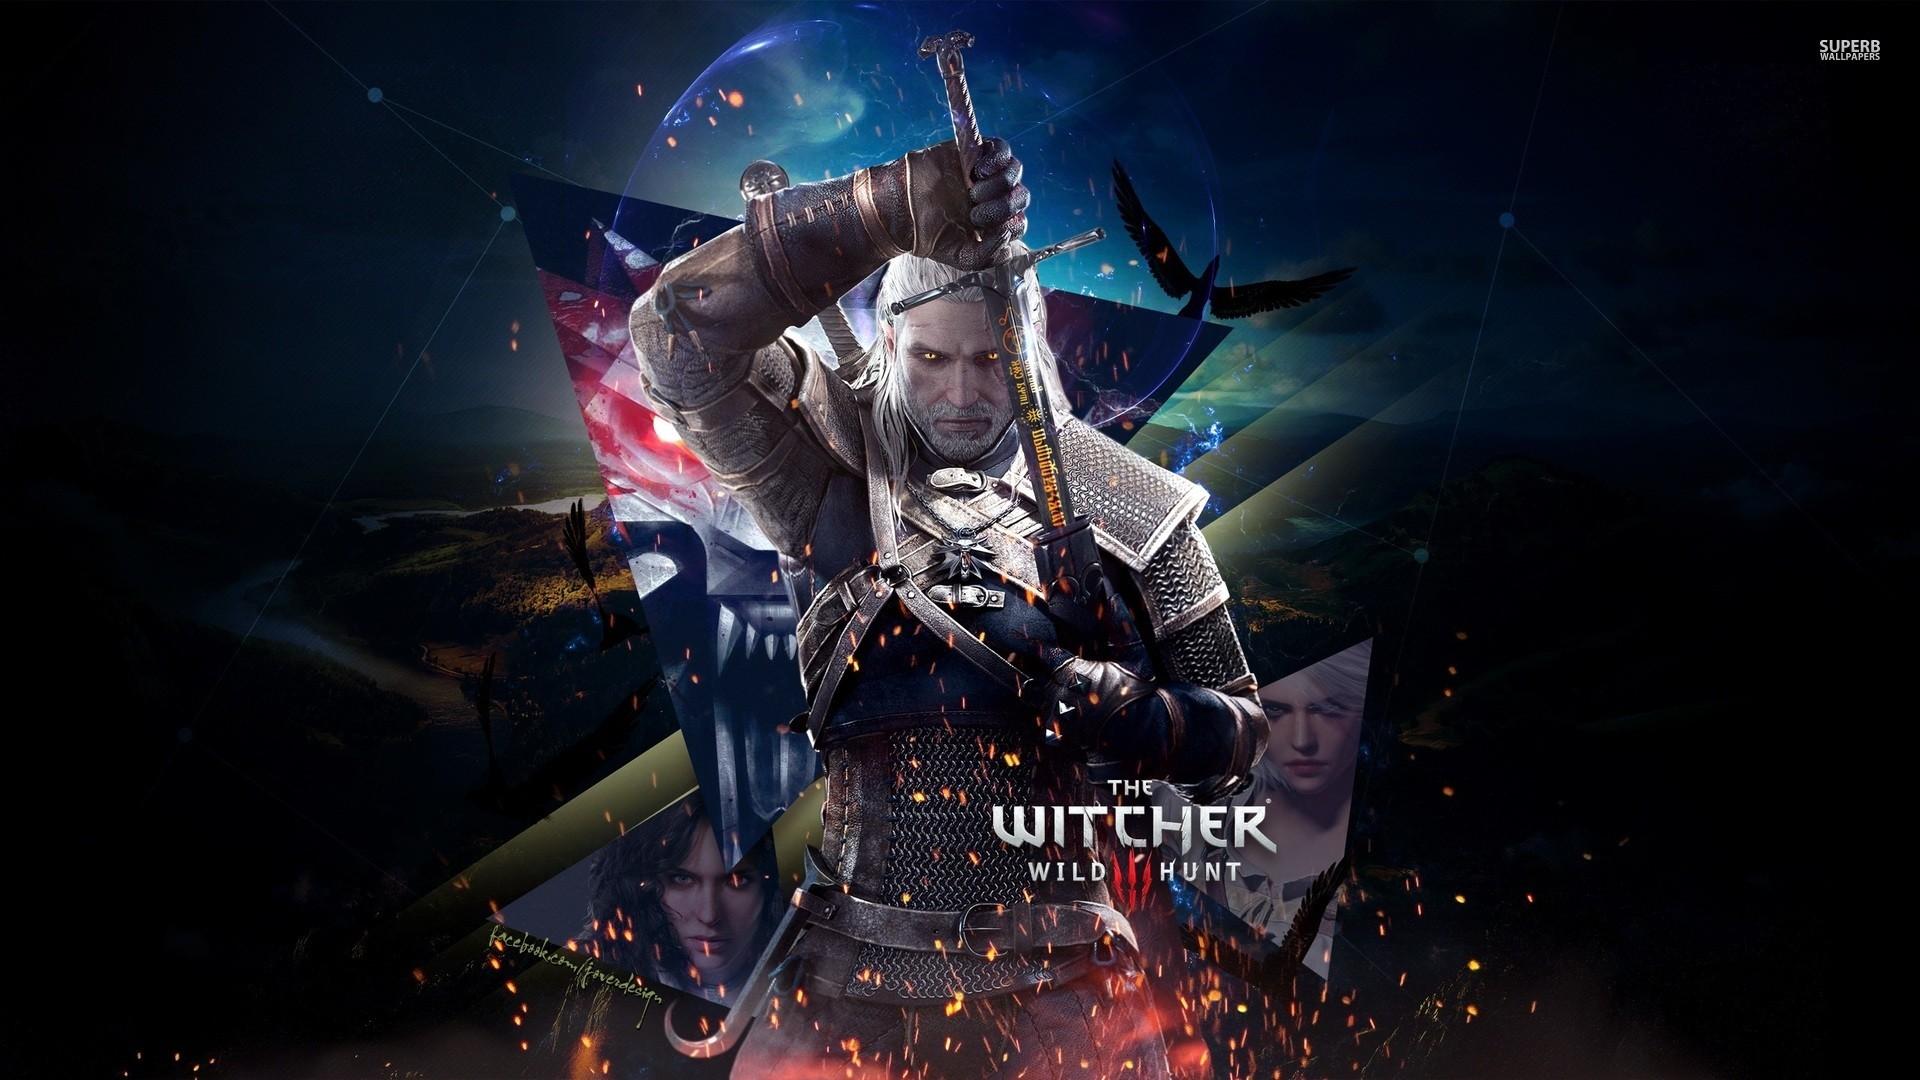 The Witcher 3 Wallpaper – wallpaper.